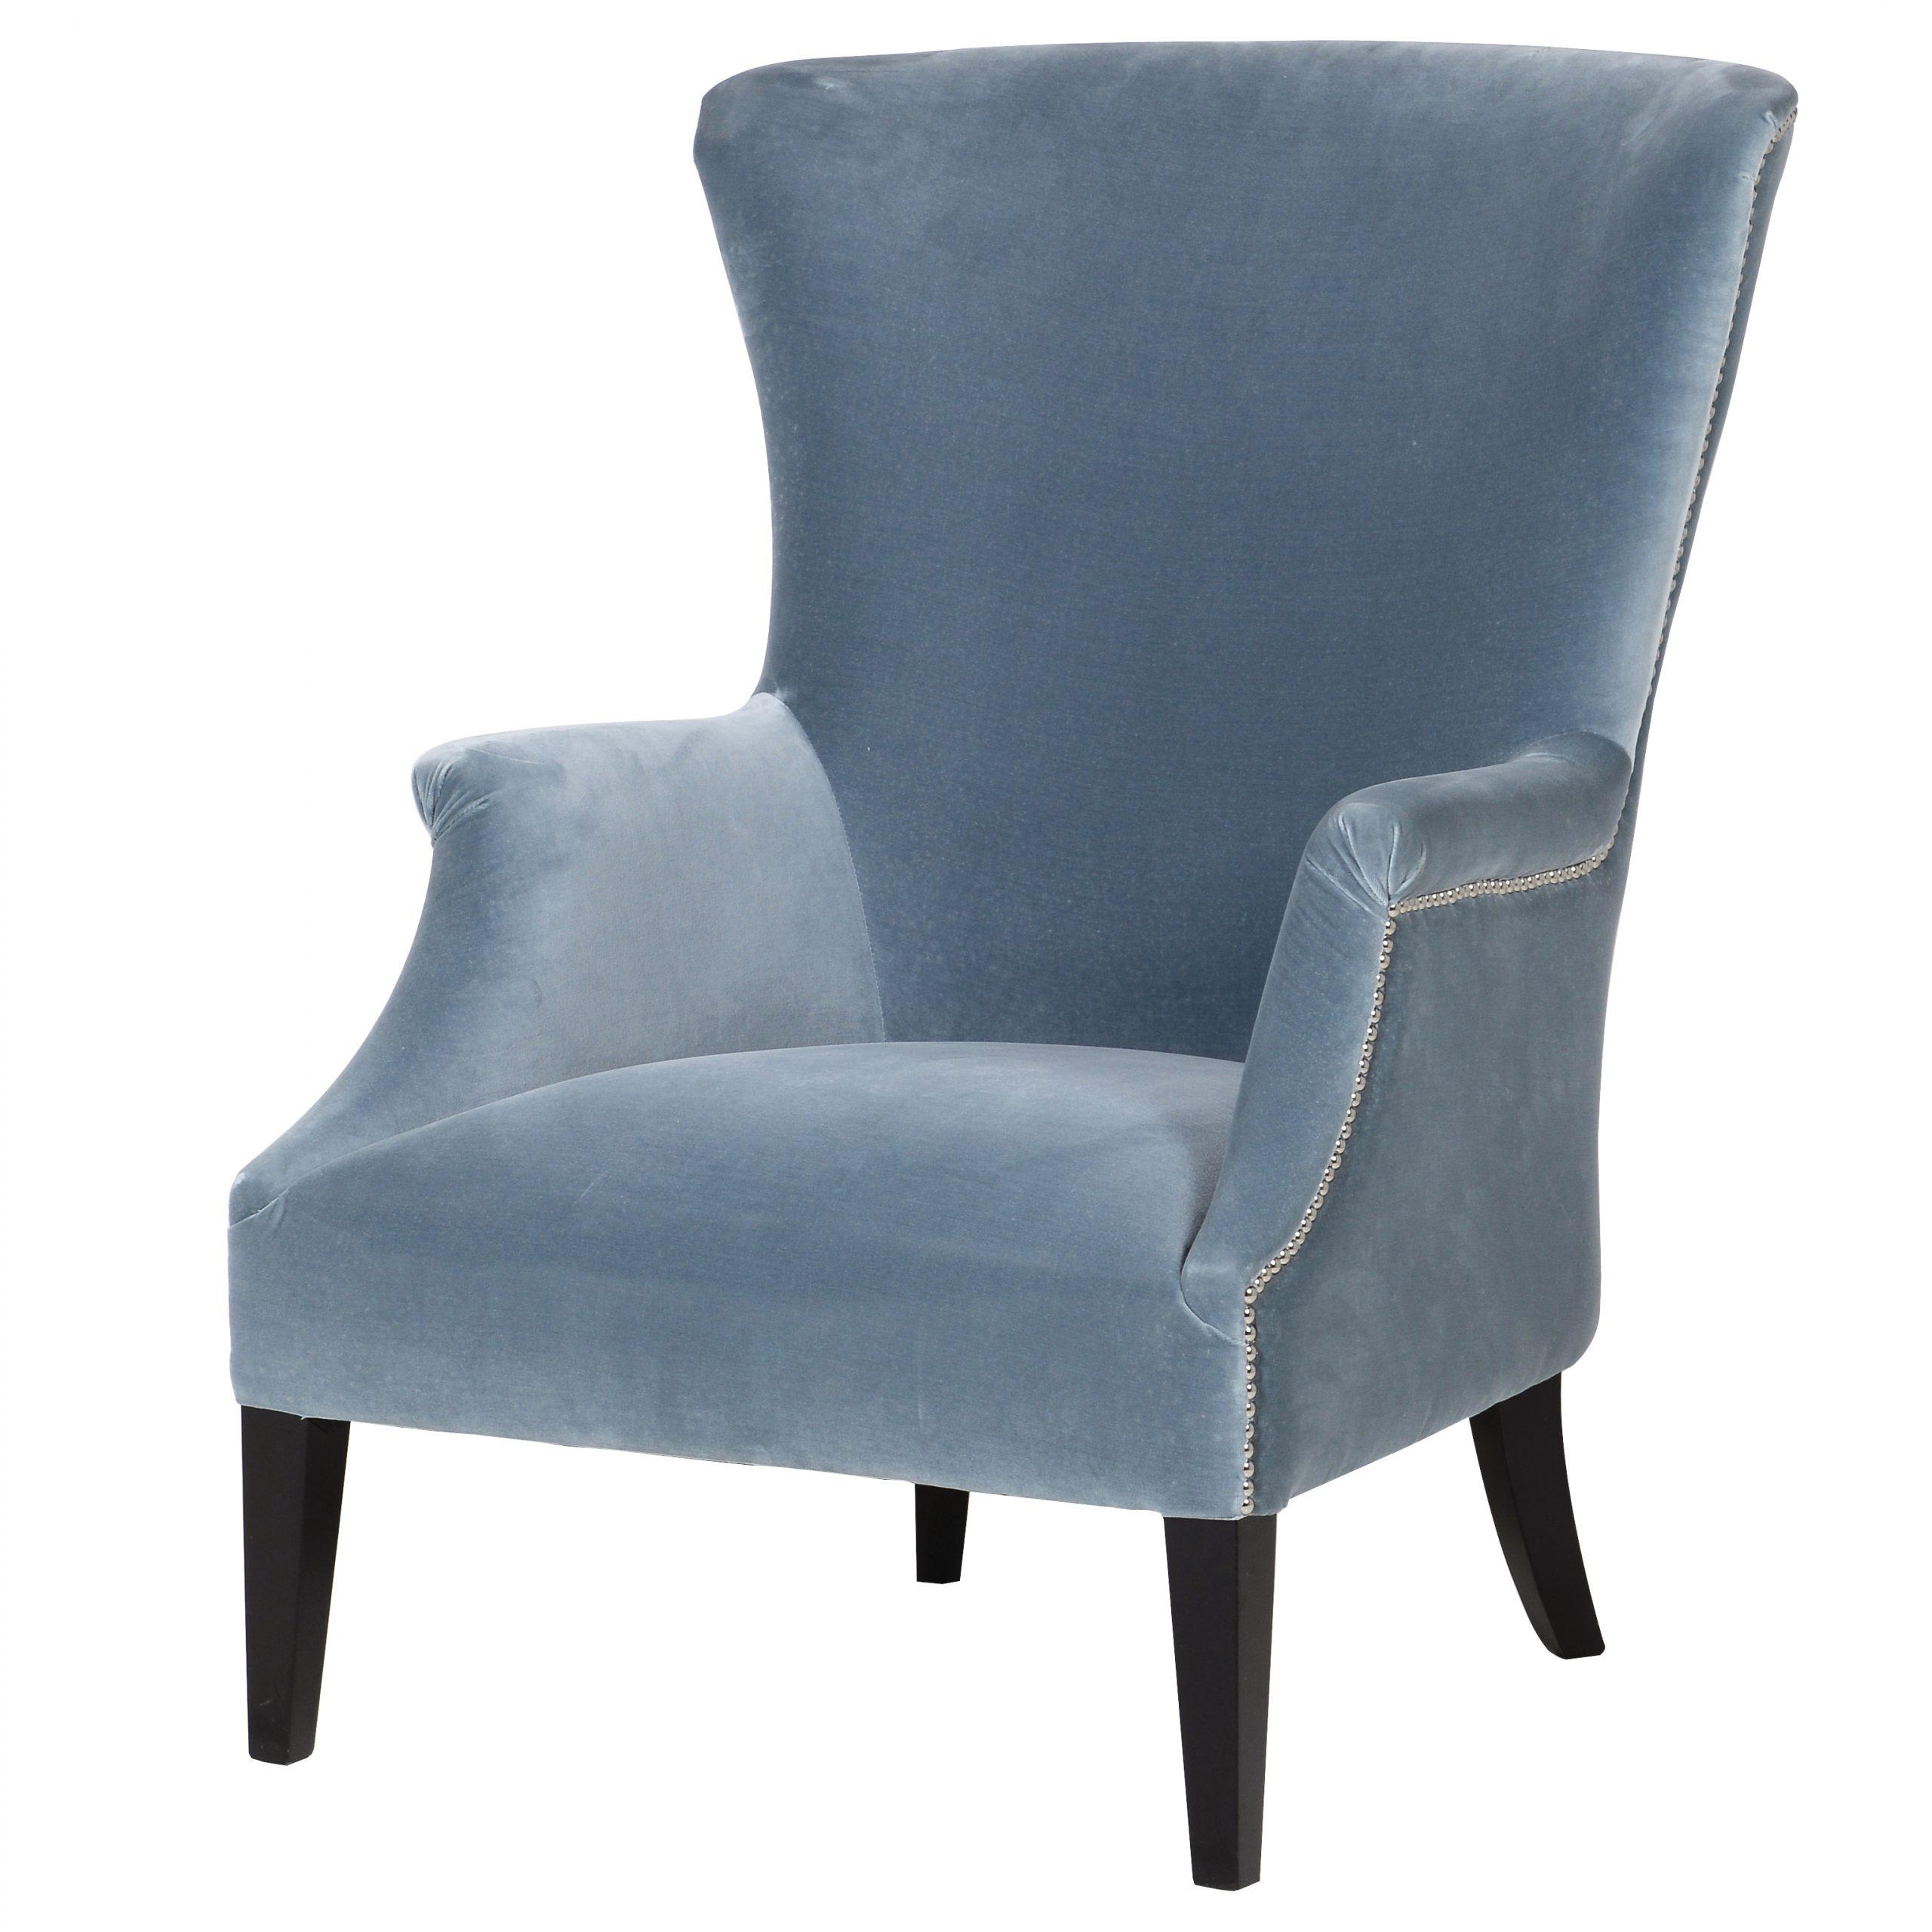 Pastel blue studded chair, £990, Needwood Living, Alrewas, www.needwoodliving.co.uk